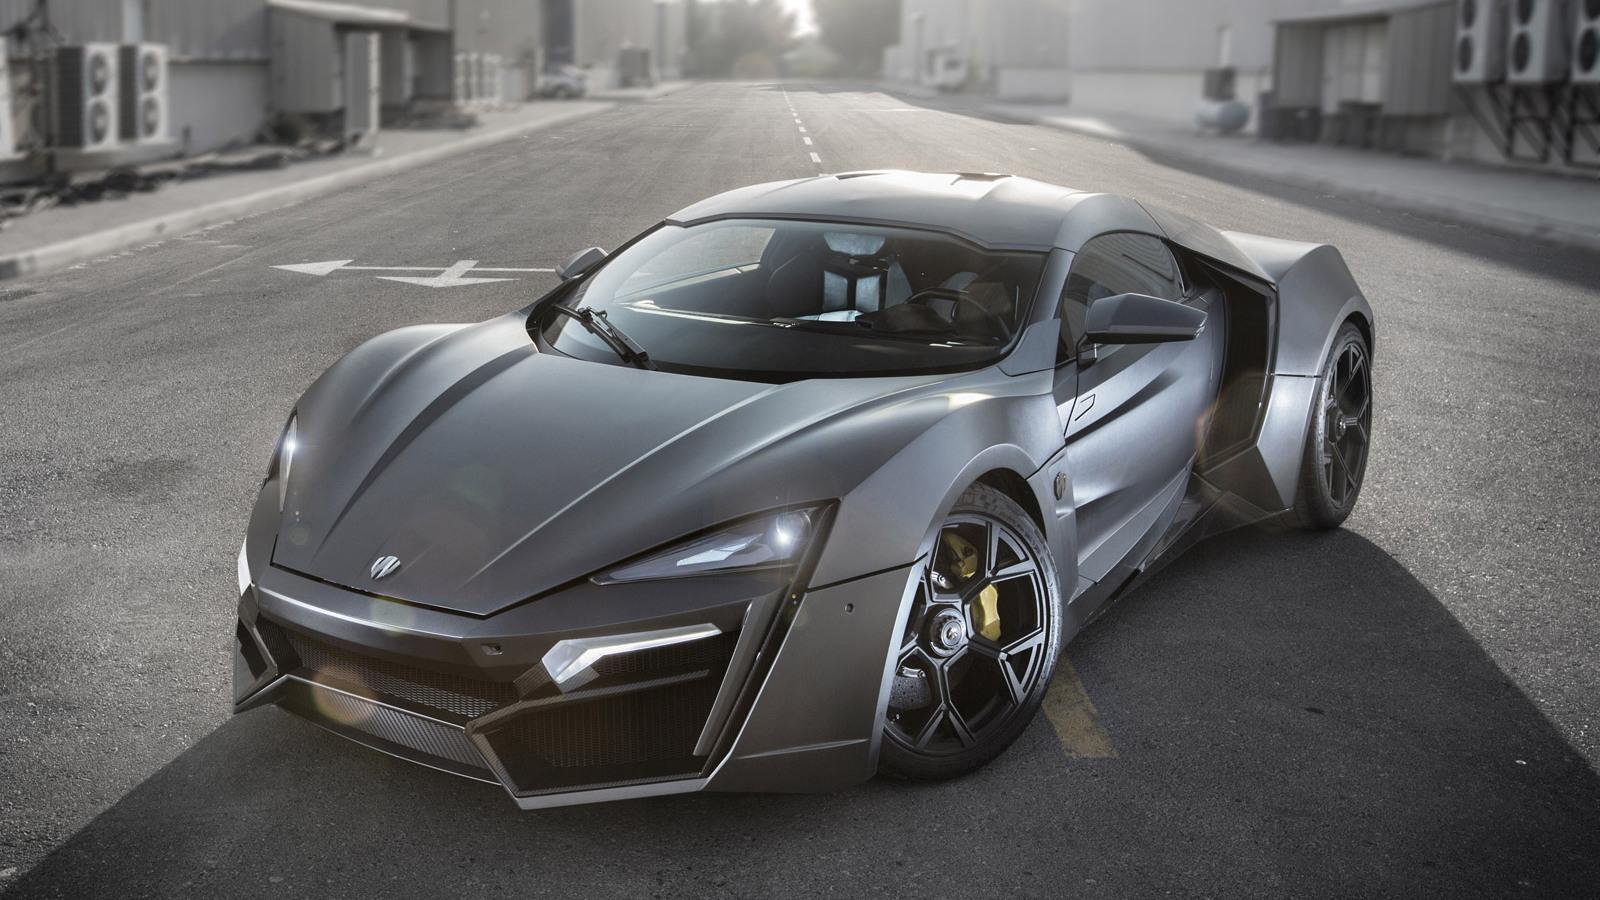 770 horsepower lykan hypersport set for 2014 top marques monaco debut